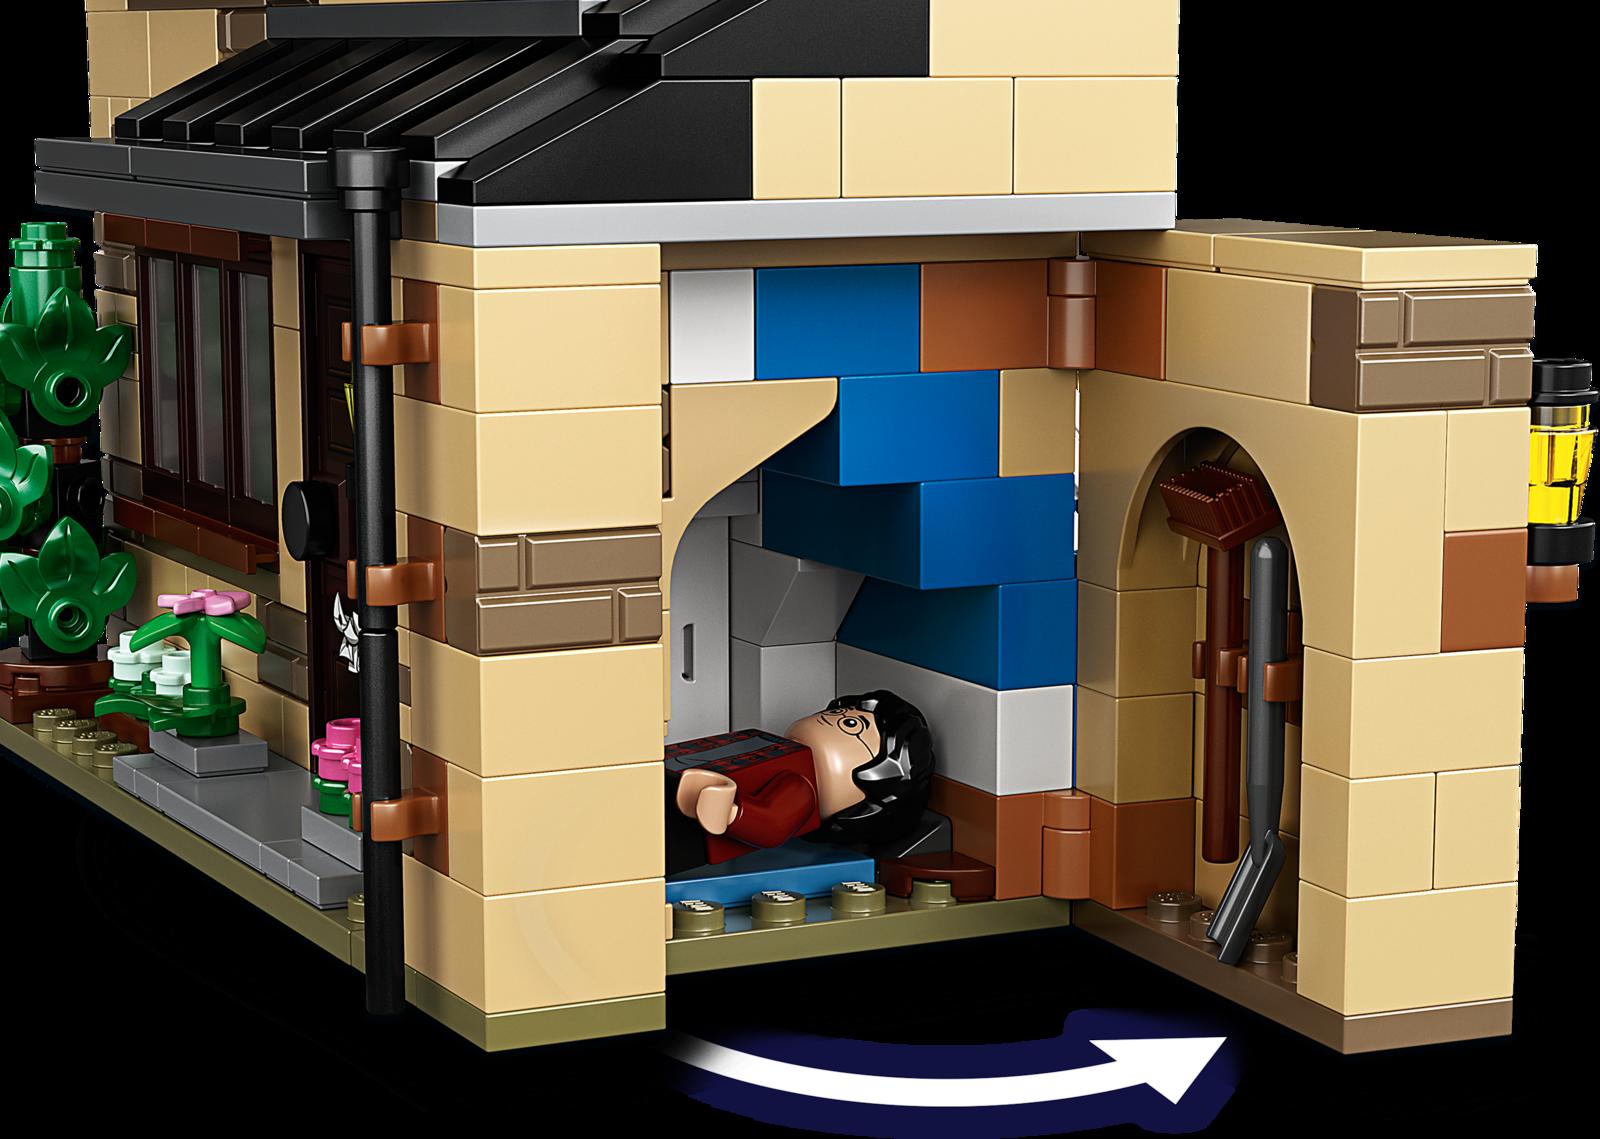 LEGO Harry Potter: 4 Privet Drive - (75968) image